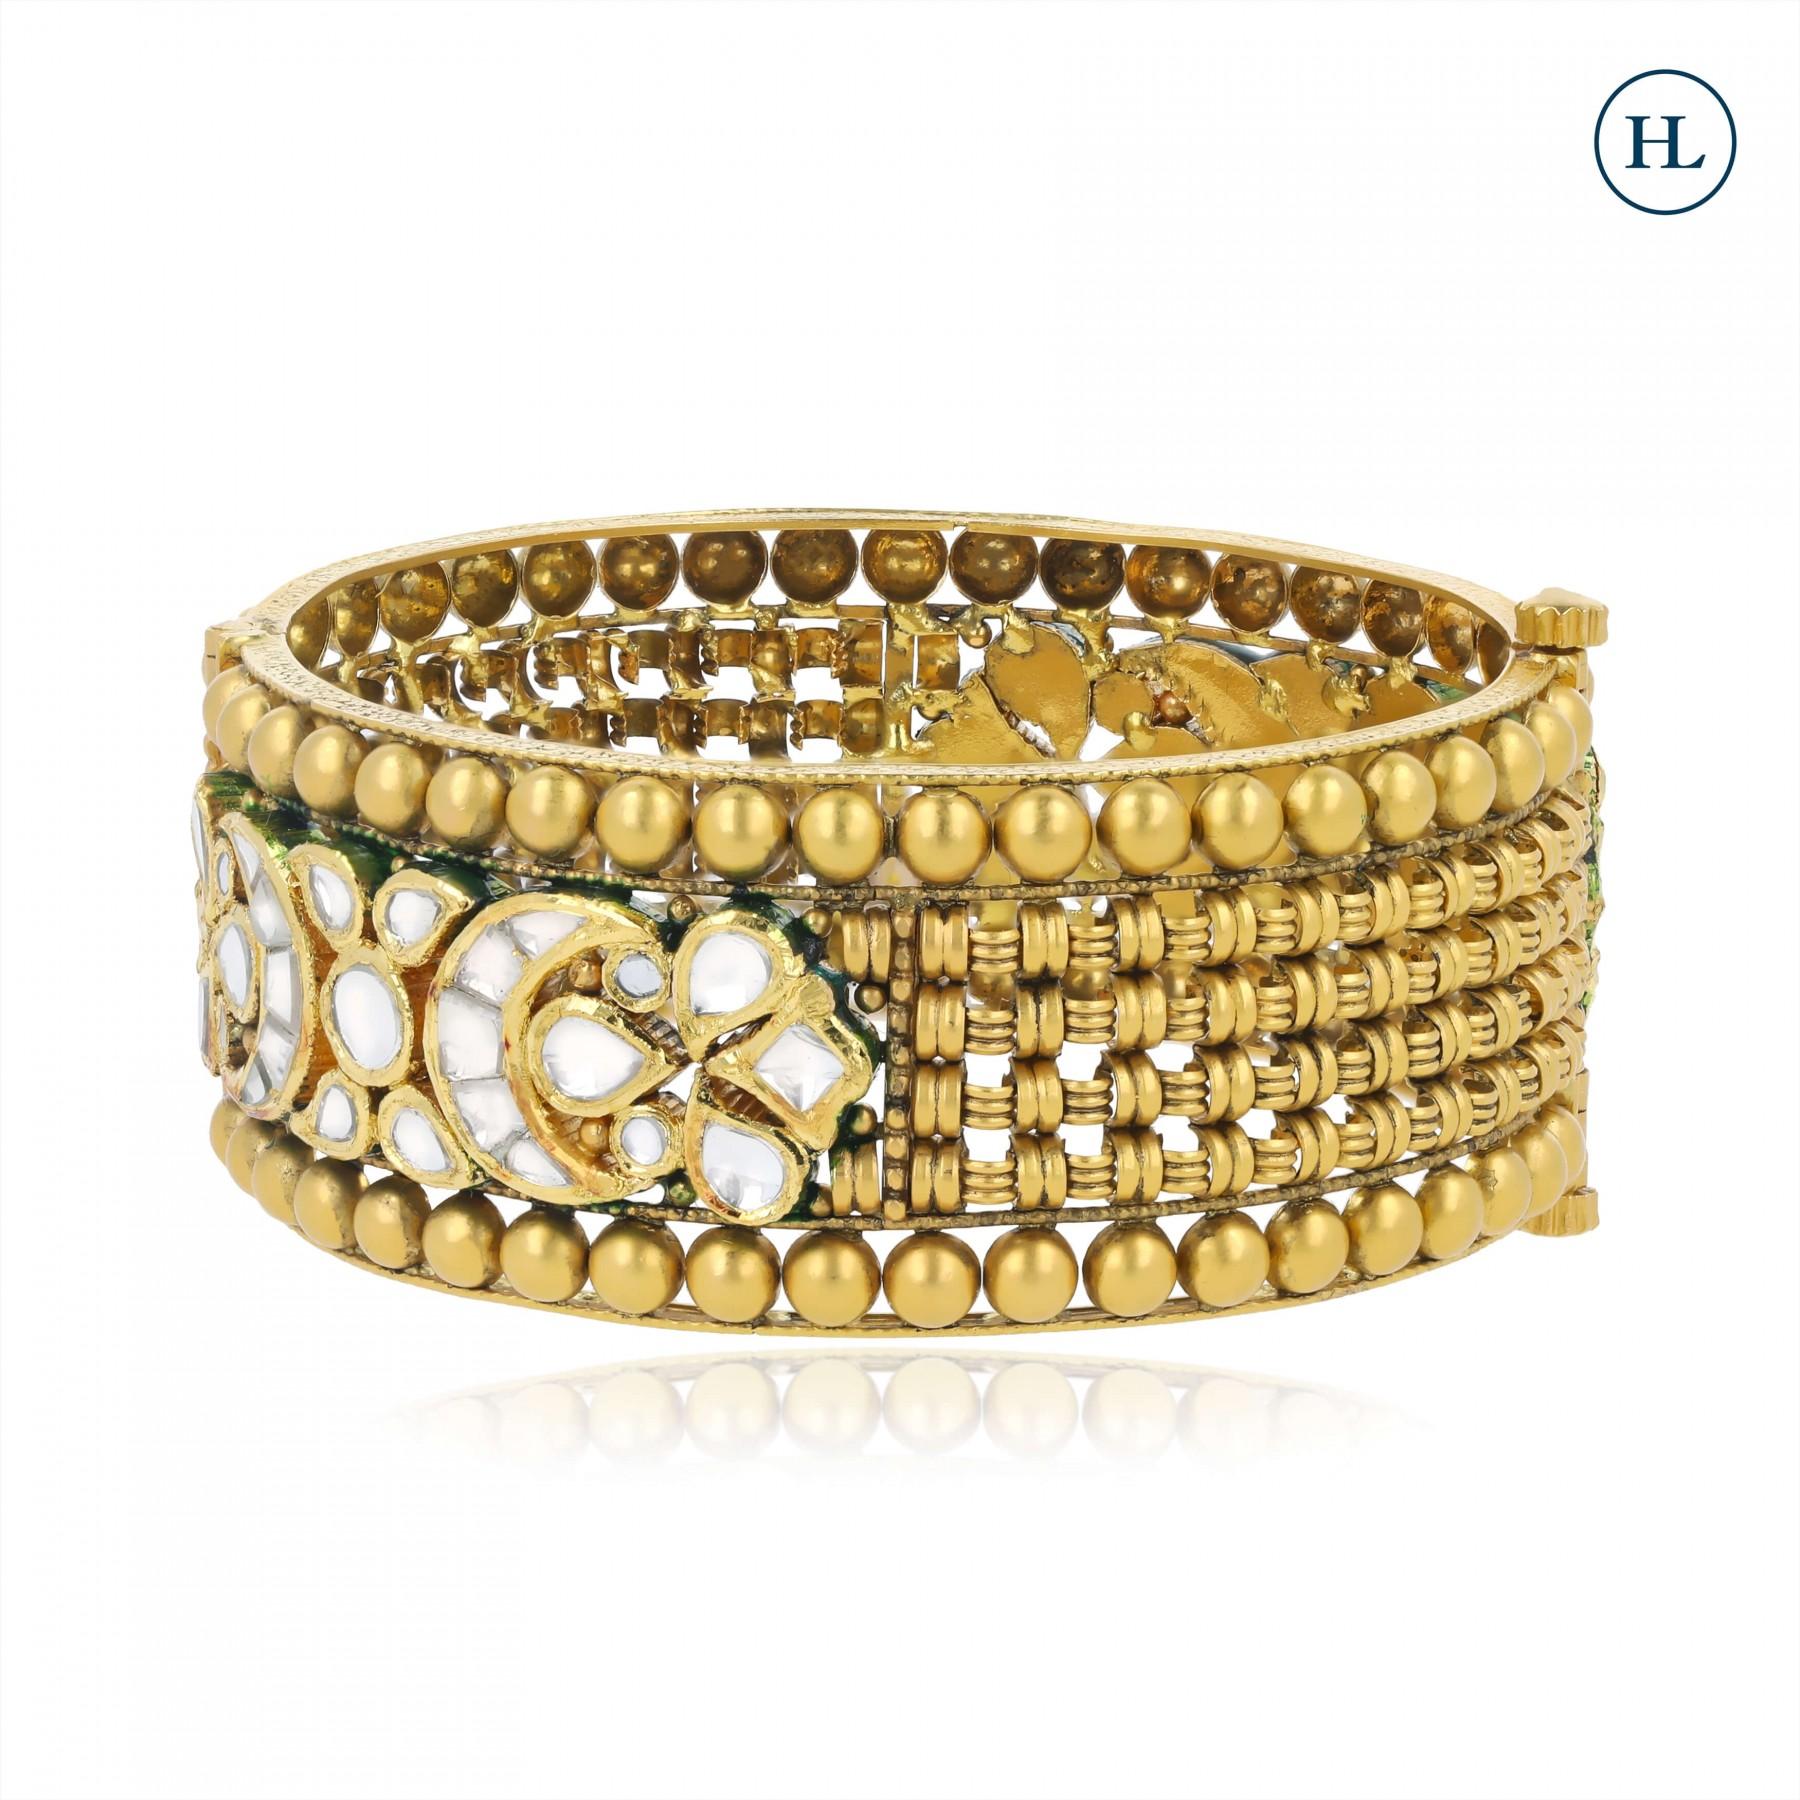 Antique-Styled Kundan & Gold Openable Bangle